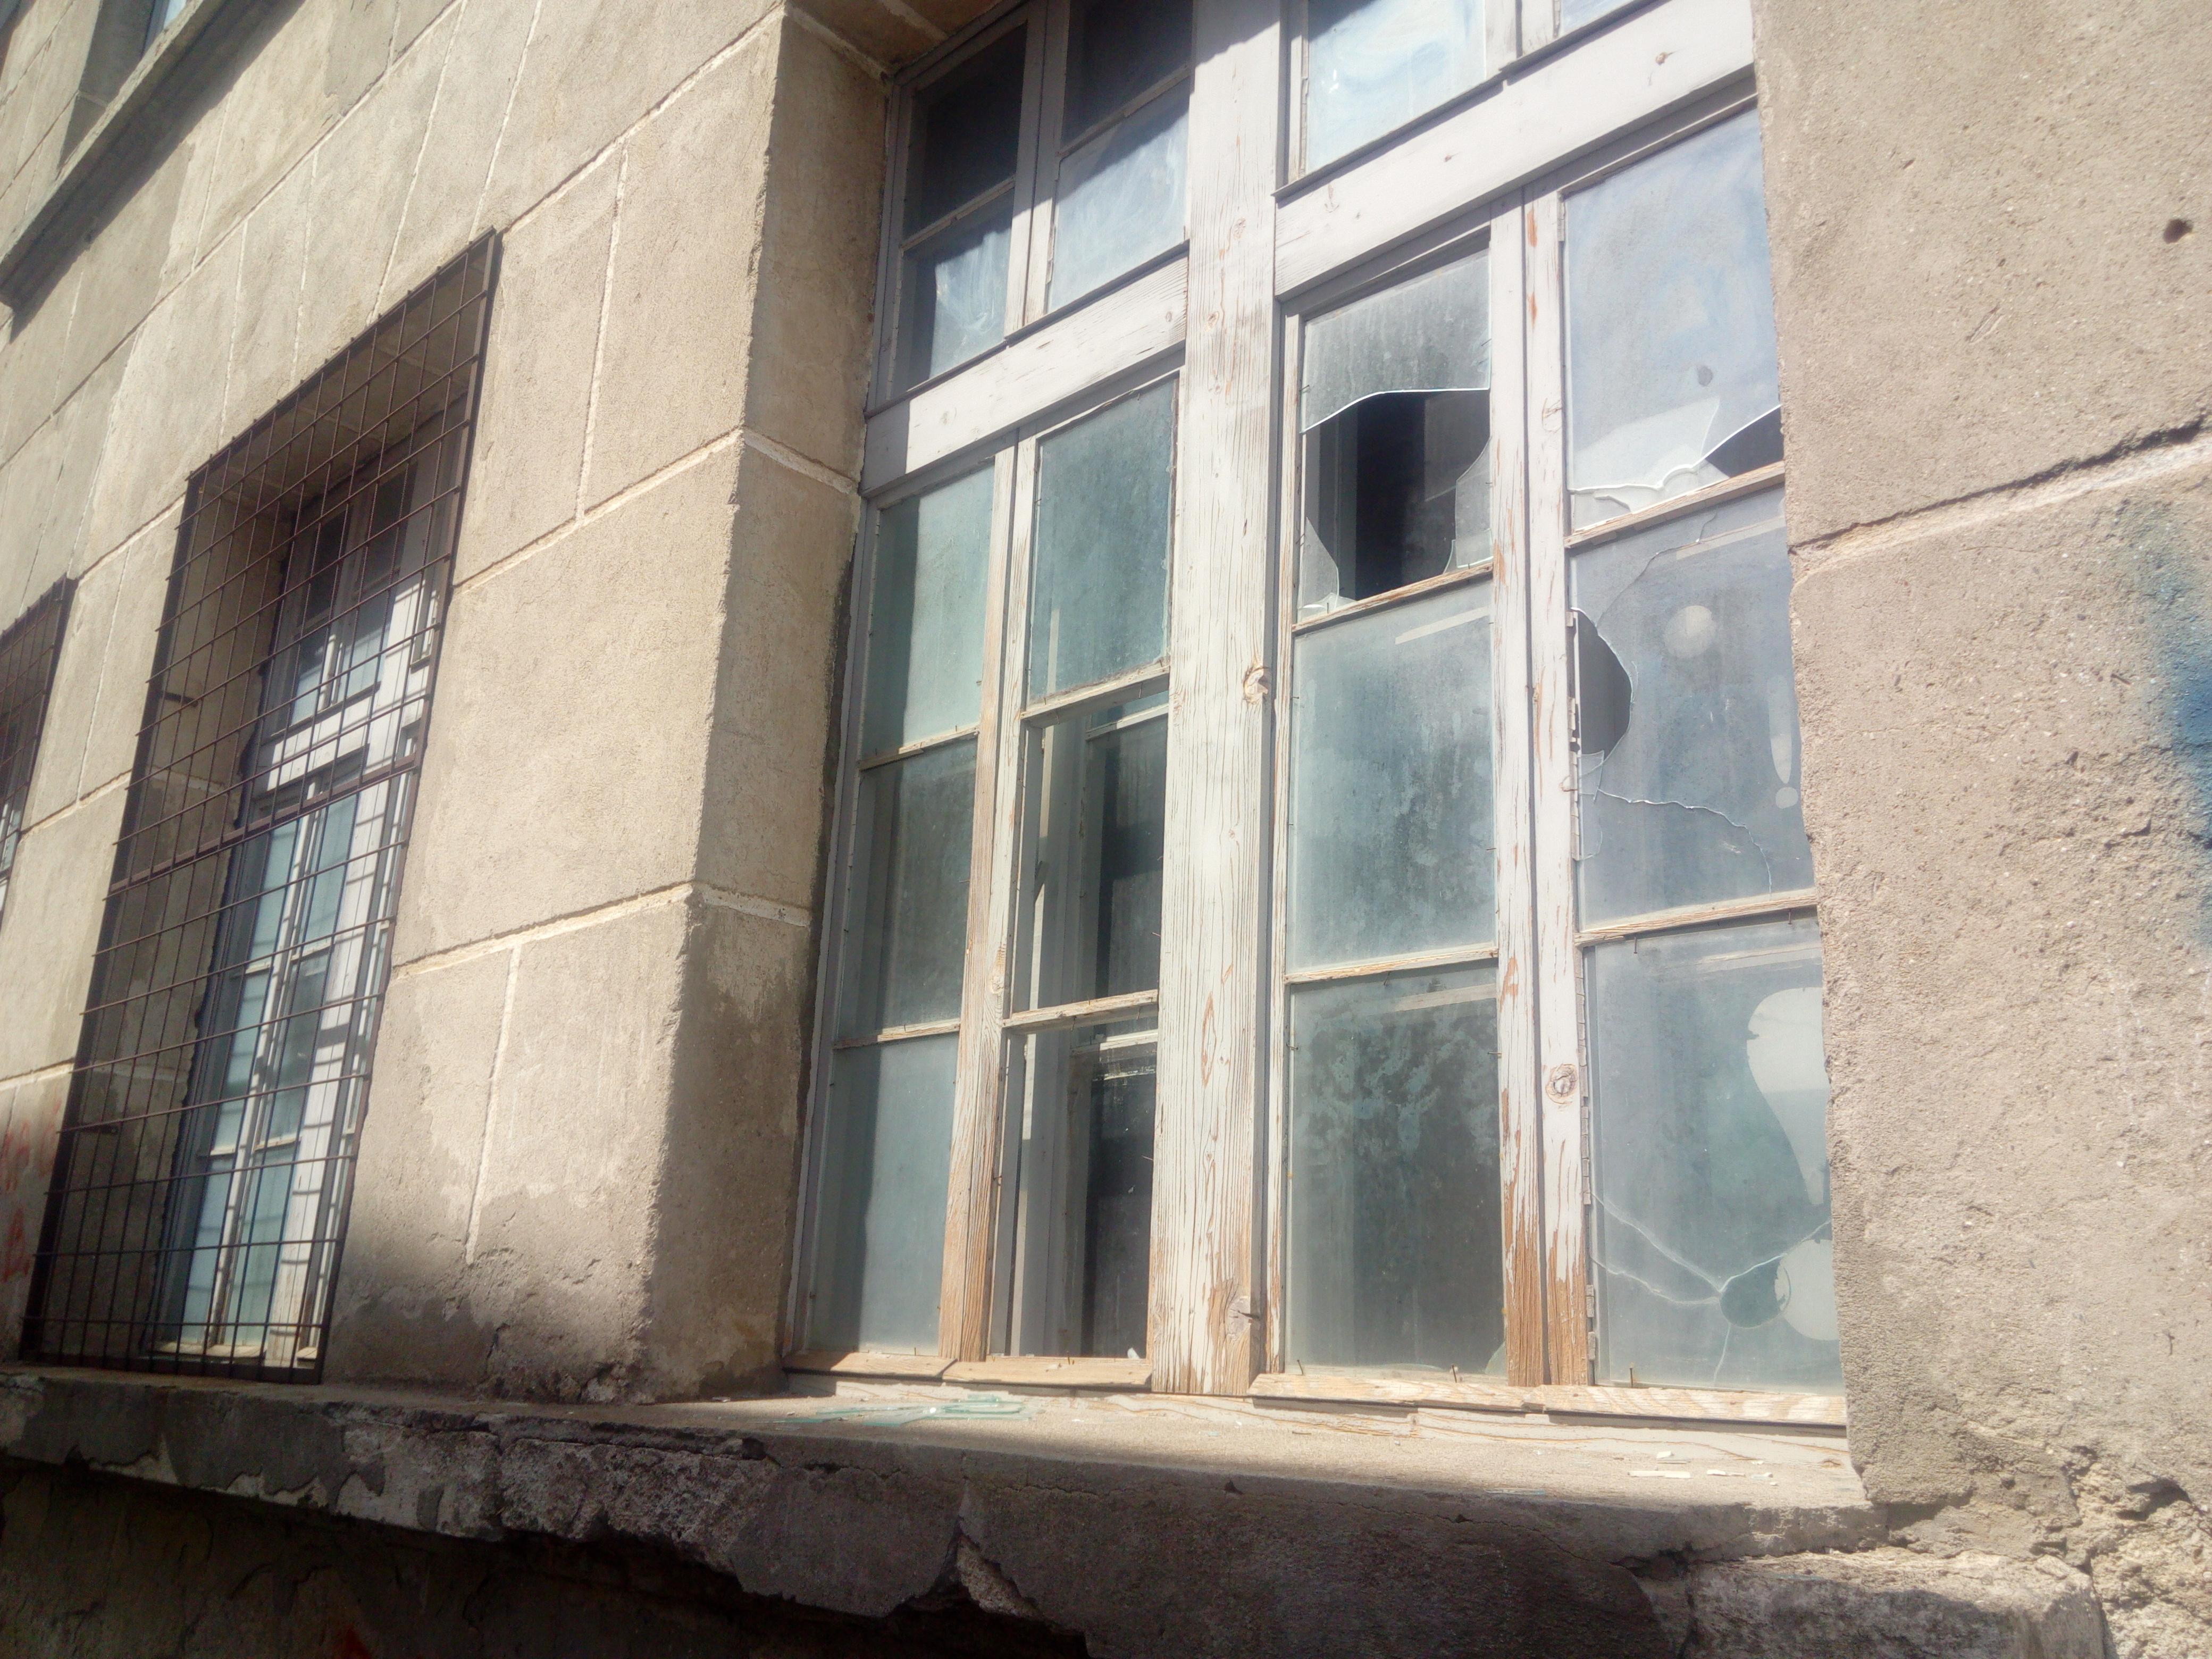 Slomljeni prozori